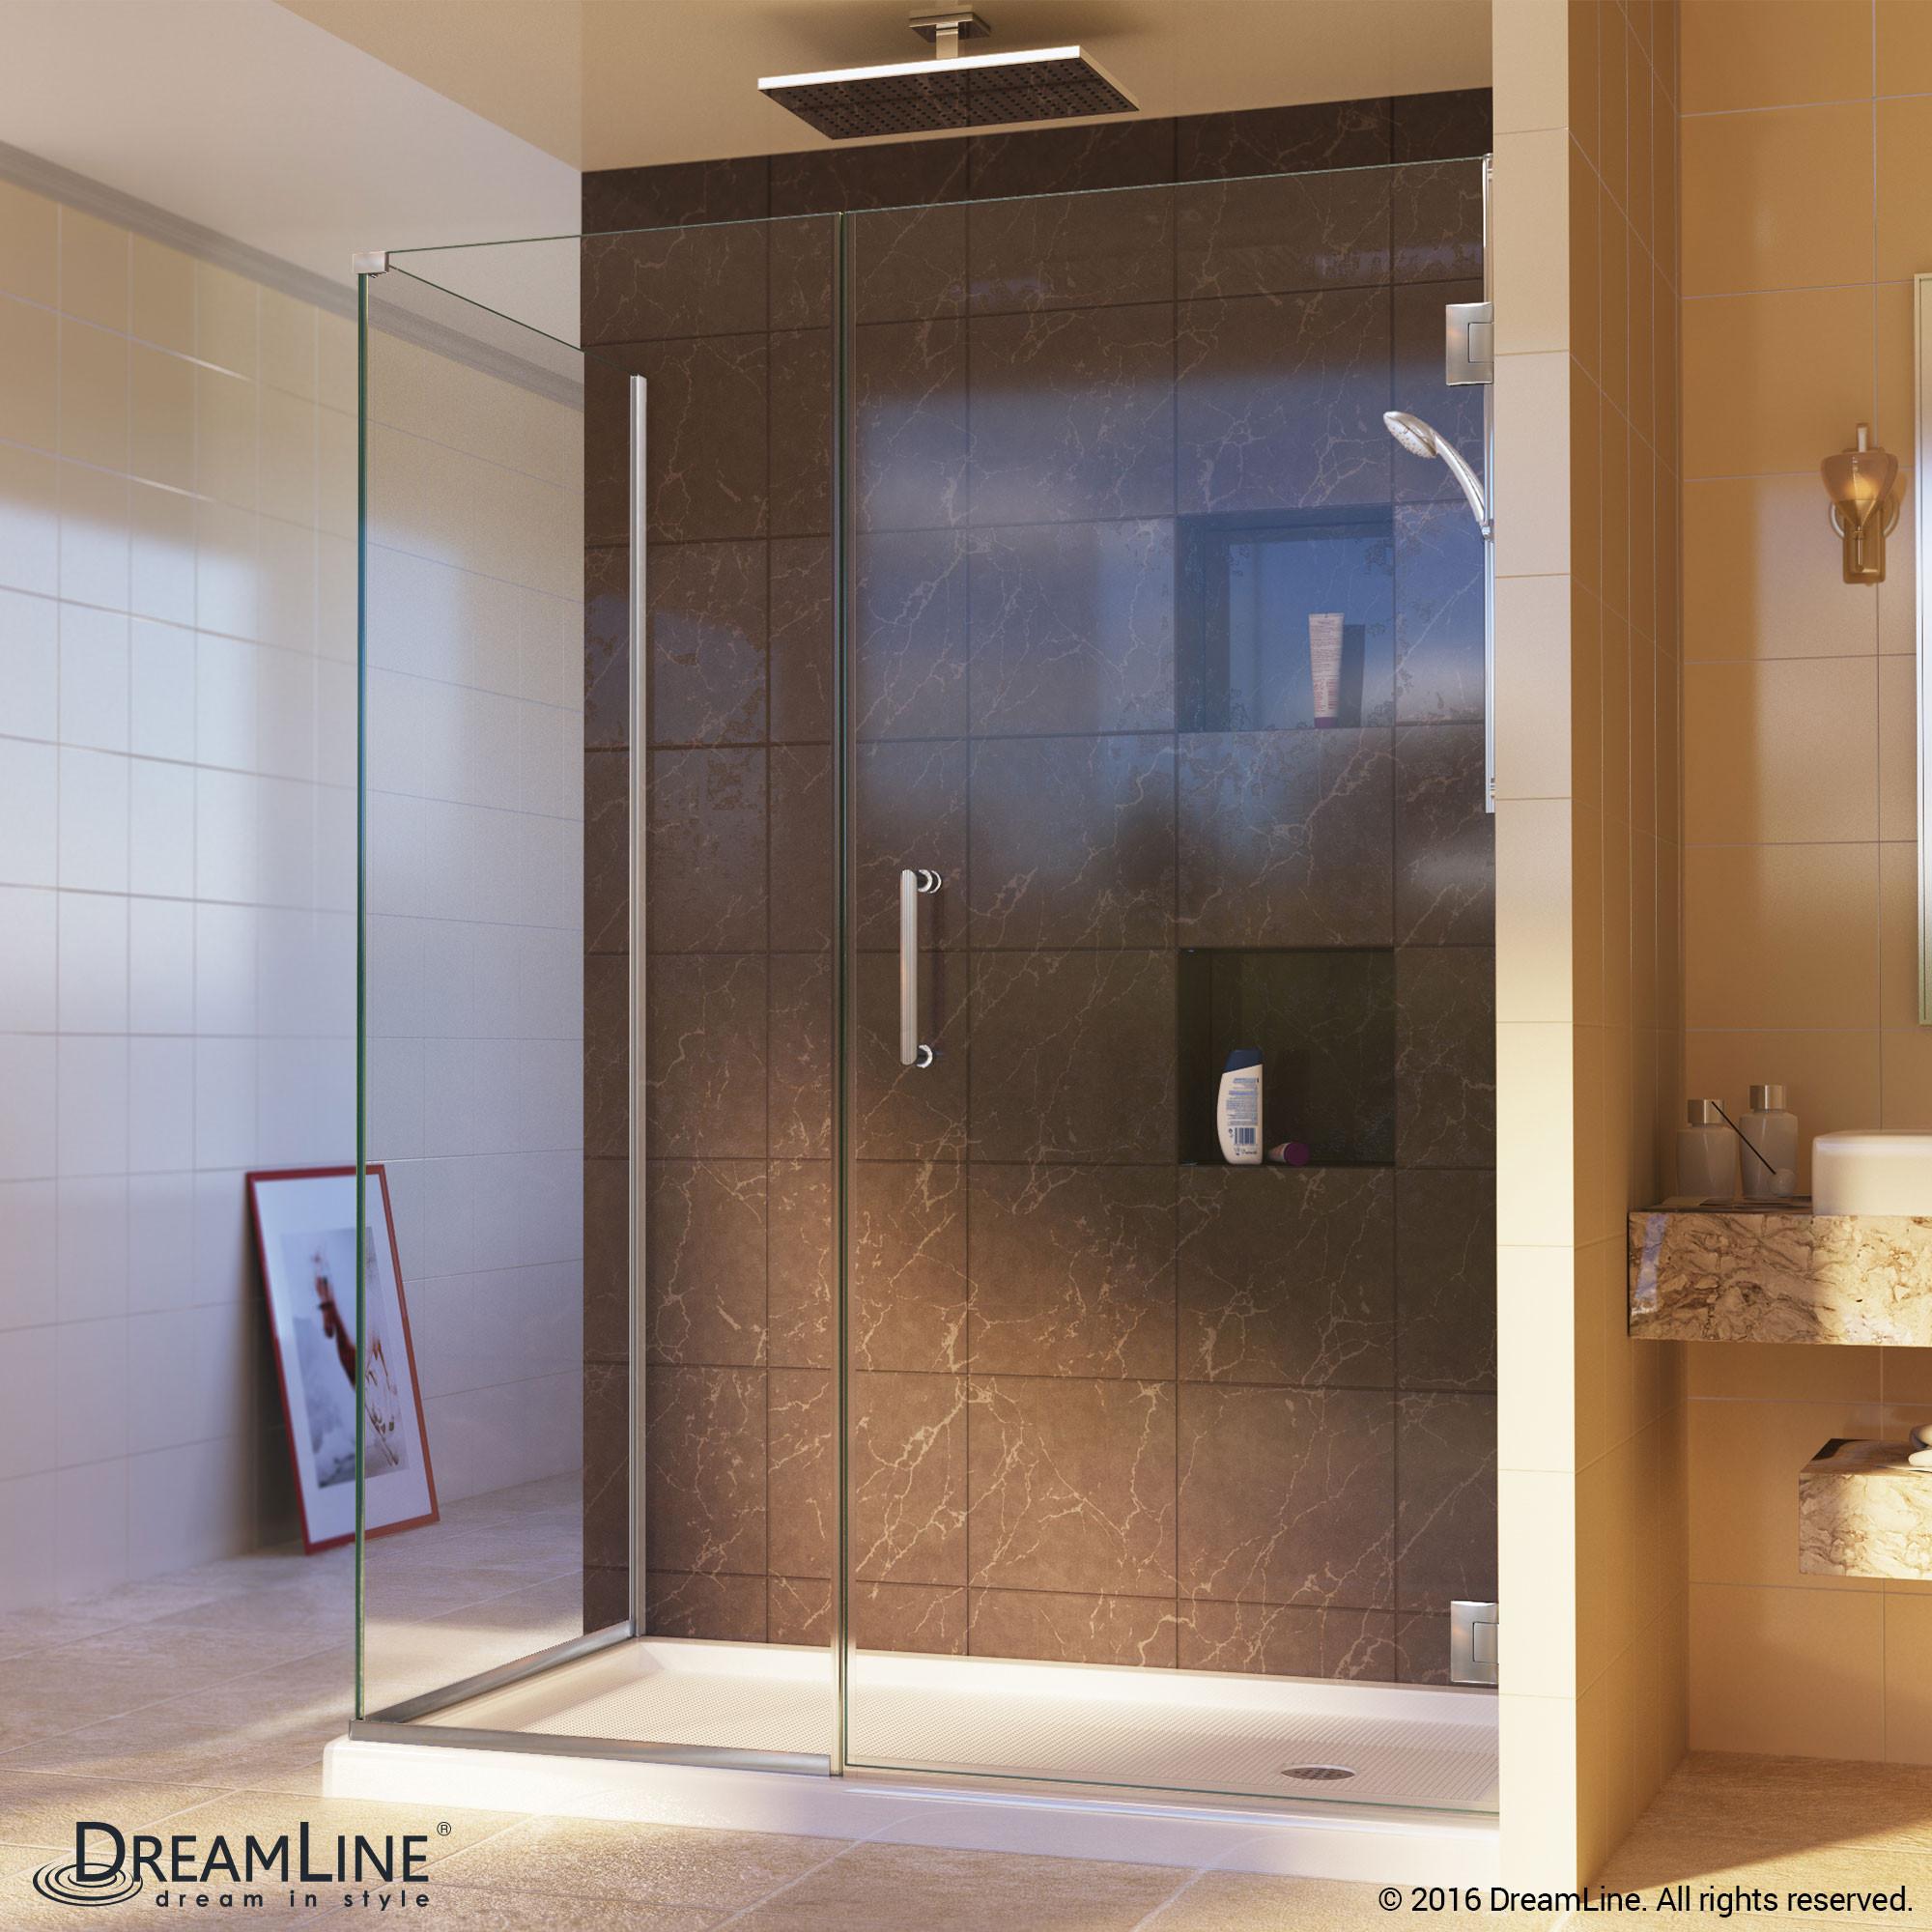 DreamLine SHEN-24370300-04 Unidoor Plus Hinged Shower Enclosure In Brushed Nickel Finish Hardware